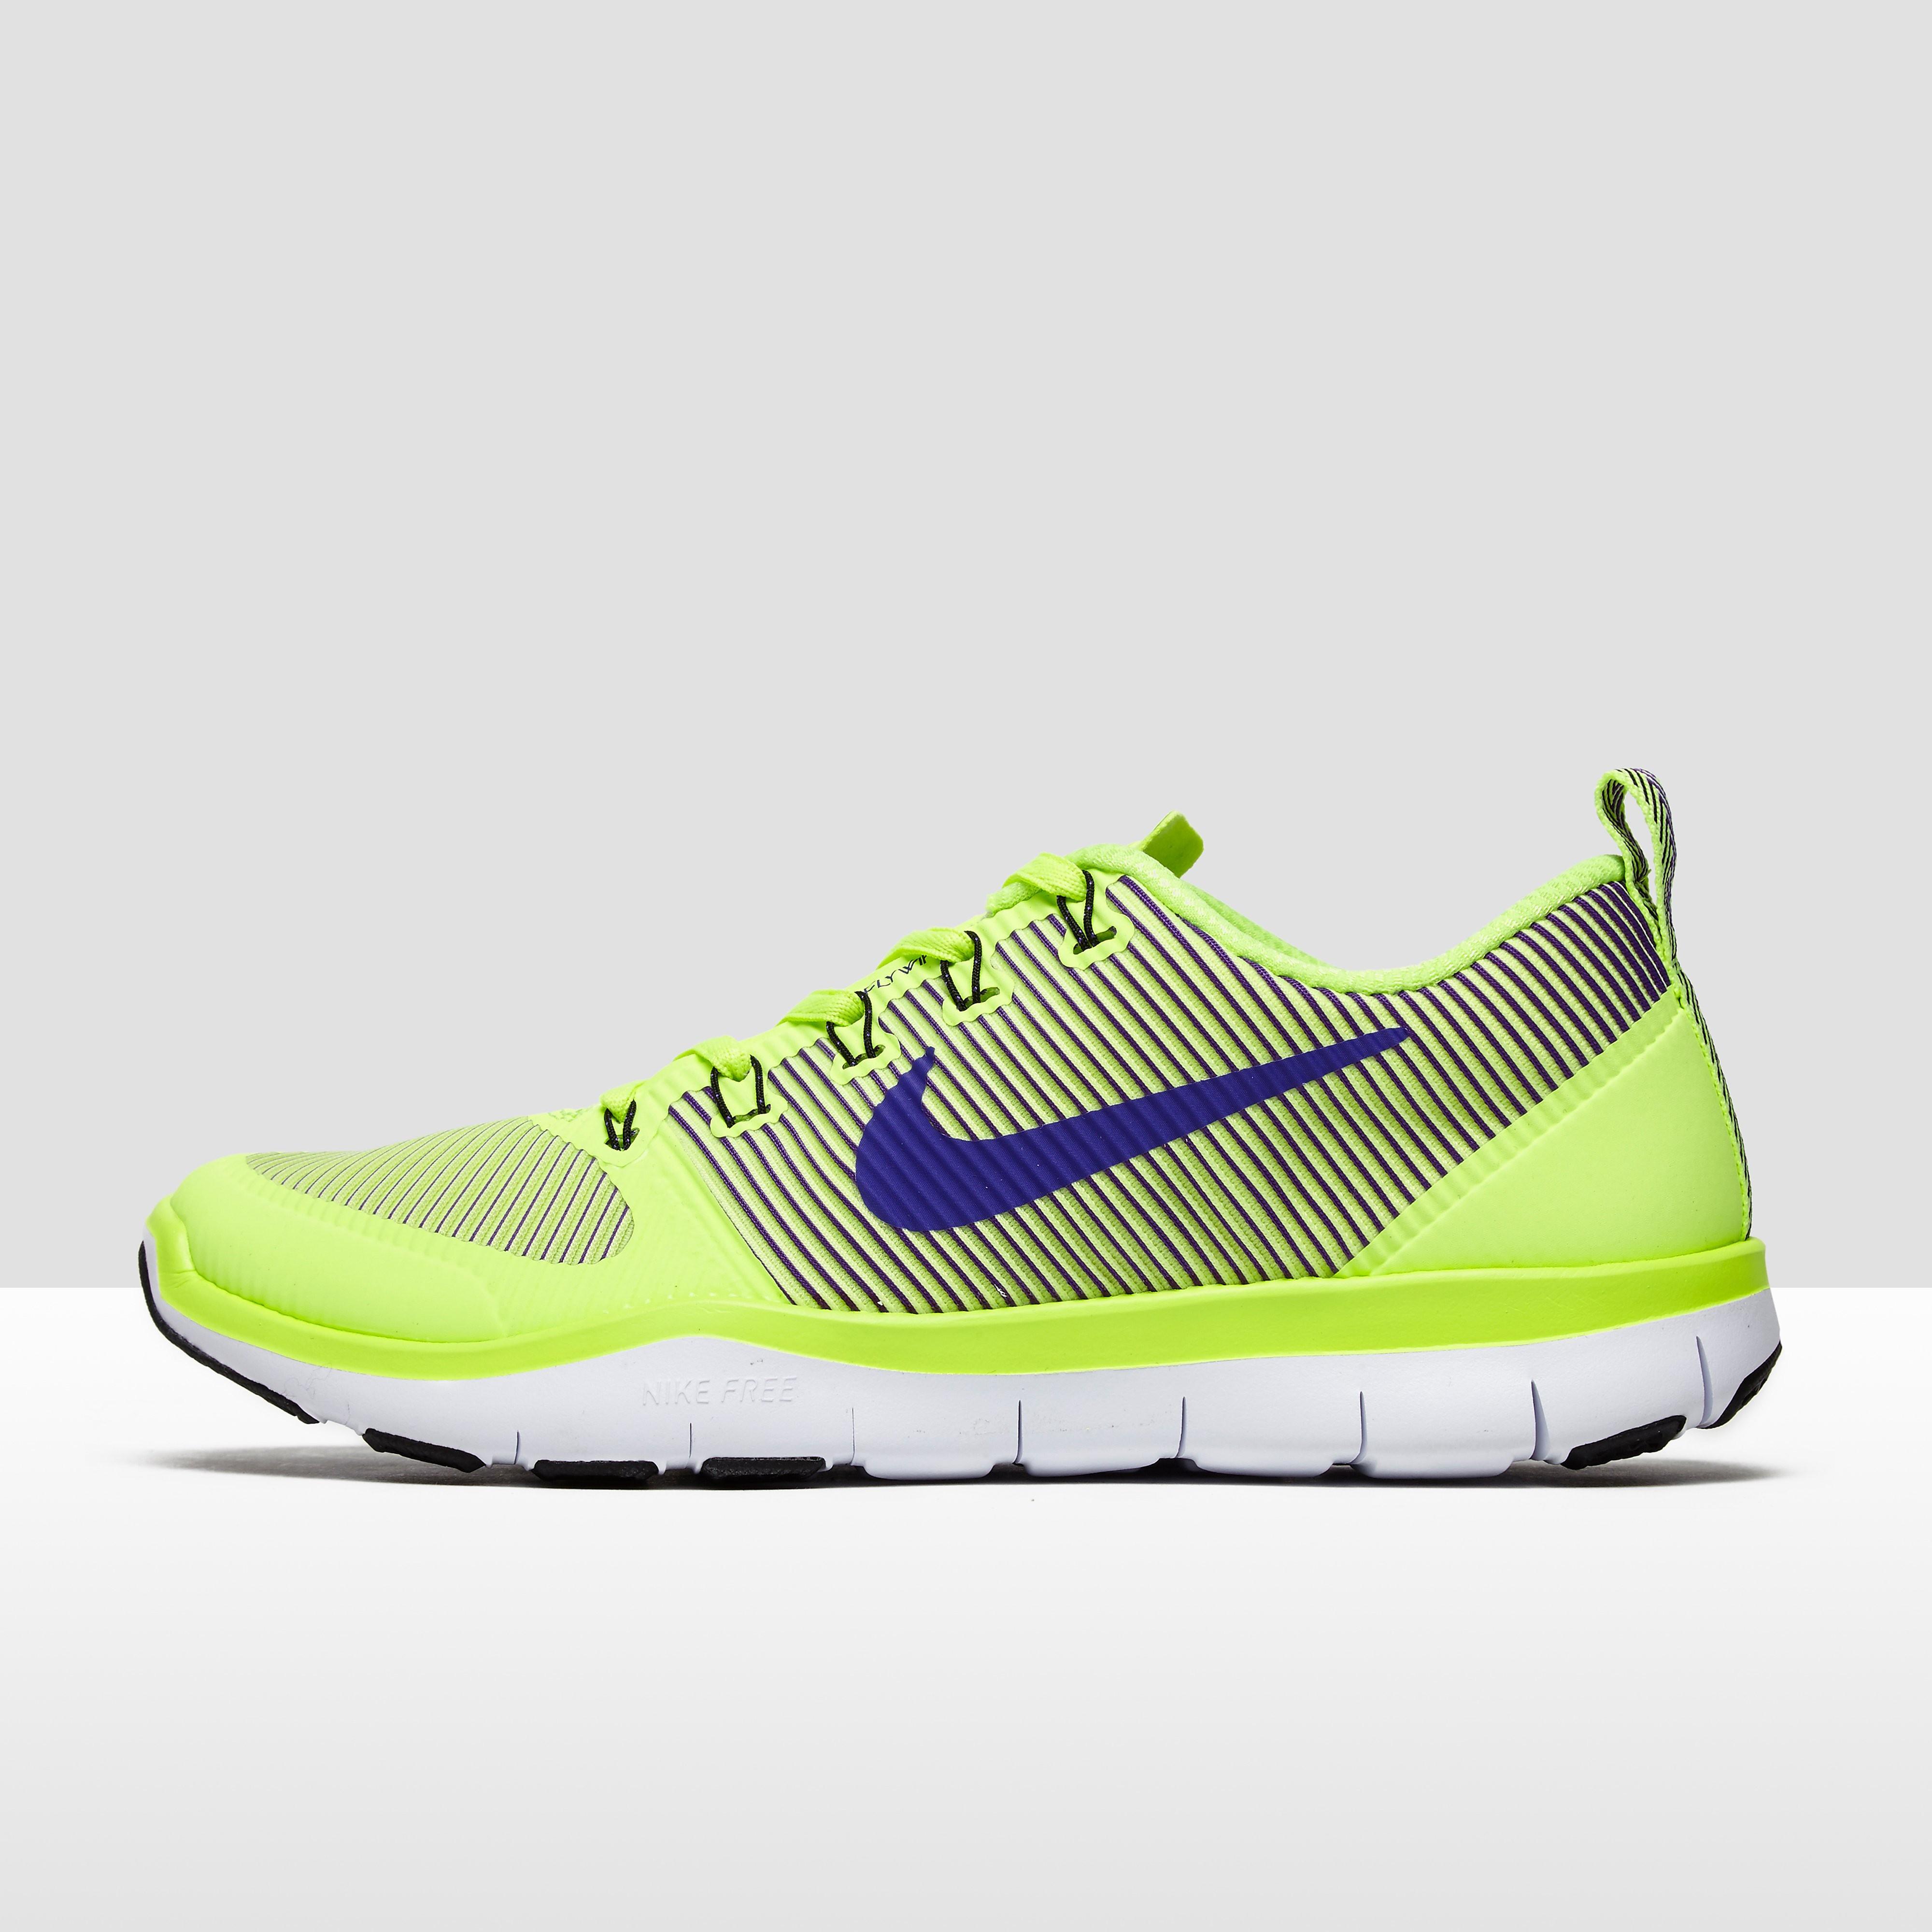 Nike Free Train Versatility Men's Training Shoes